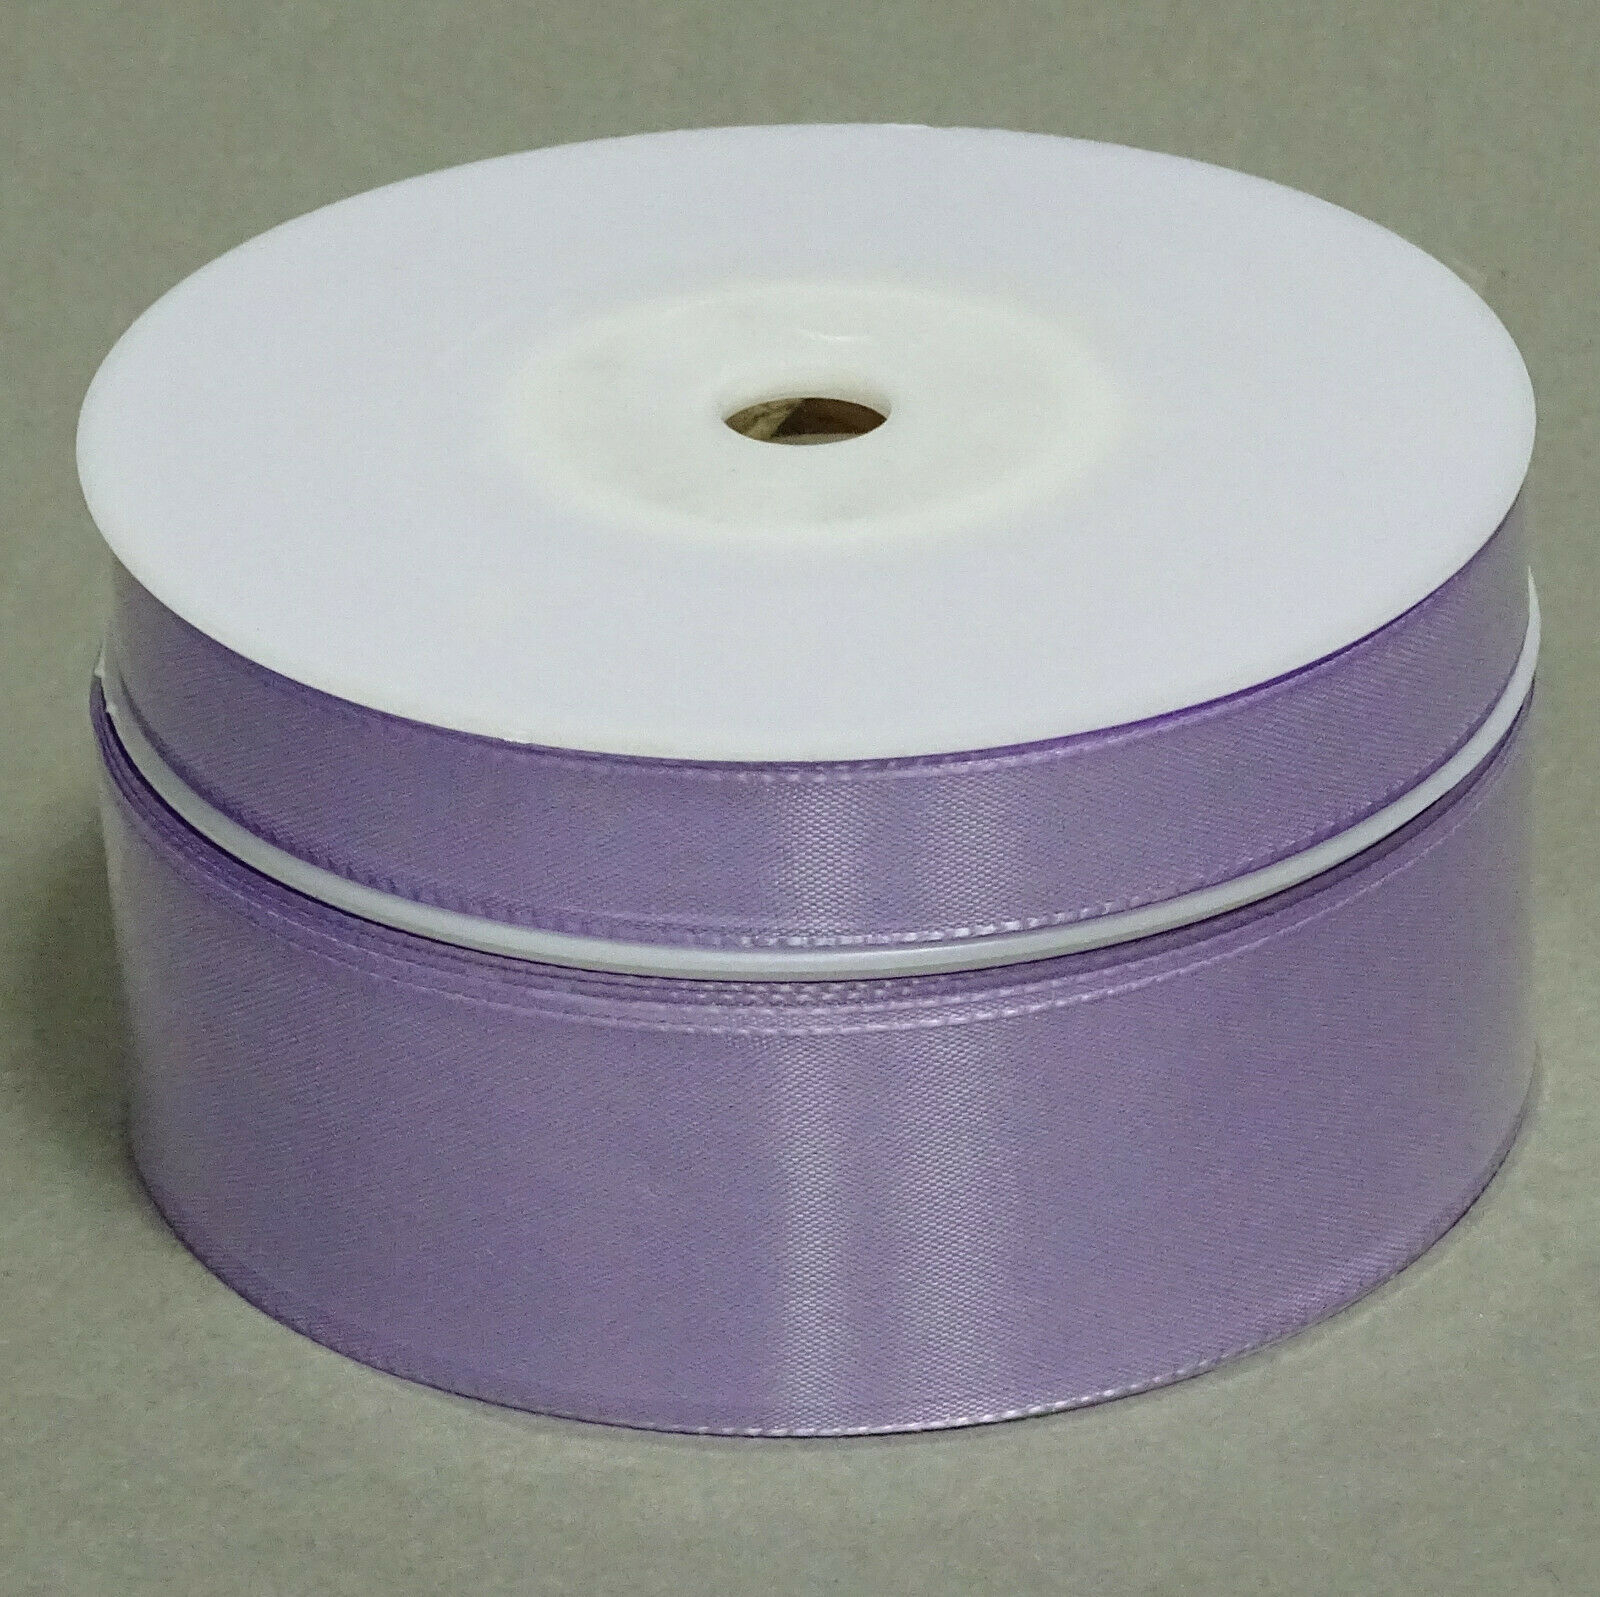 Seidenband Schleifenband 50 m x 15 mm / 40 mm Dekoband ab 0,08 €/m Geschenkband  - Flieder 114, 40 mm x 50 m